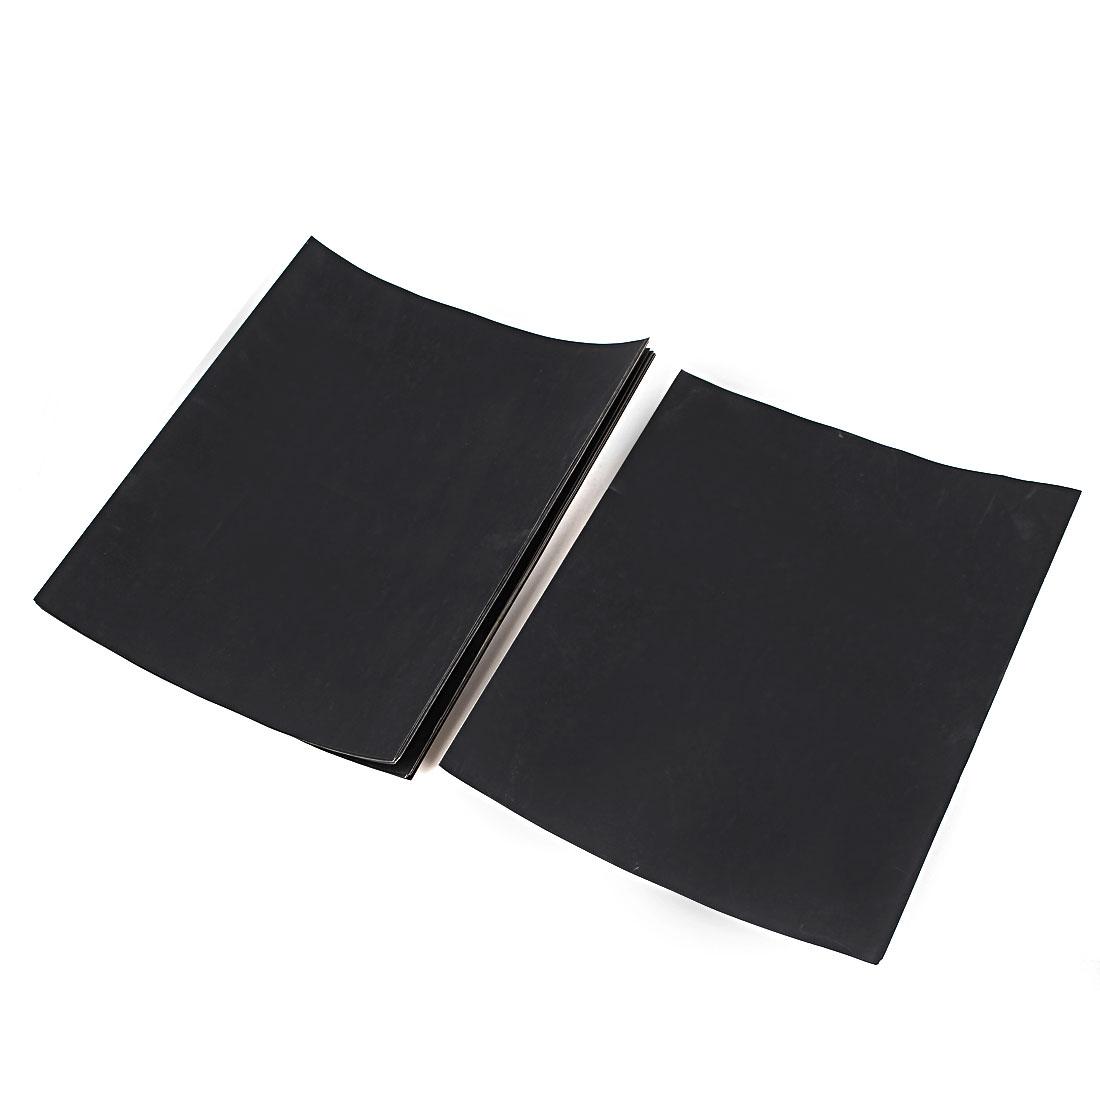 28cm x 23cm 1500 Grit Abrasive Paper Sanding Sandpaper Sand Sheet 20pcs